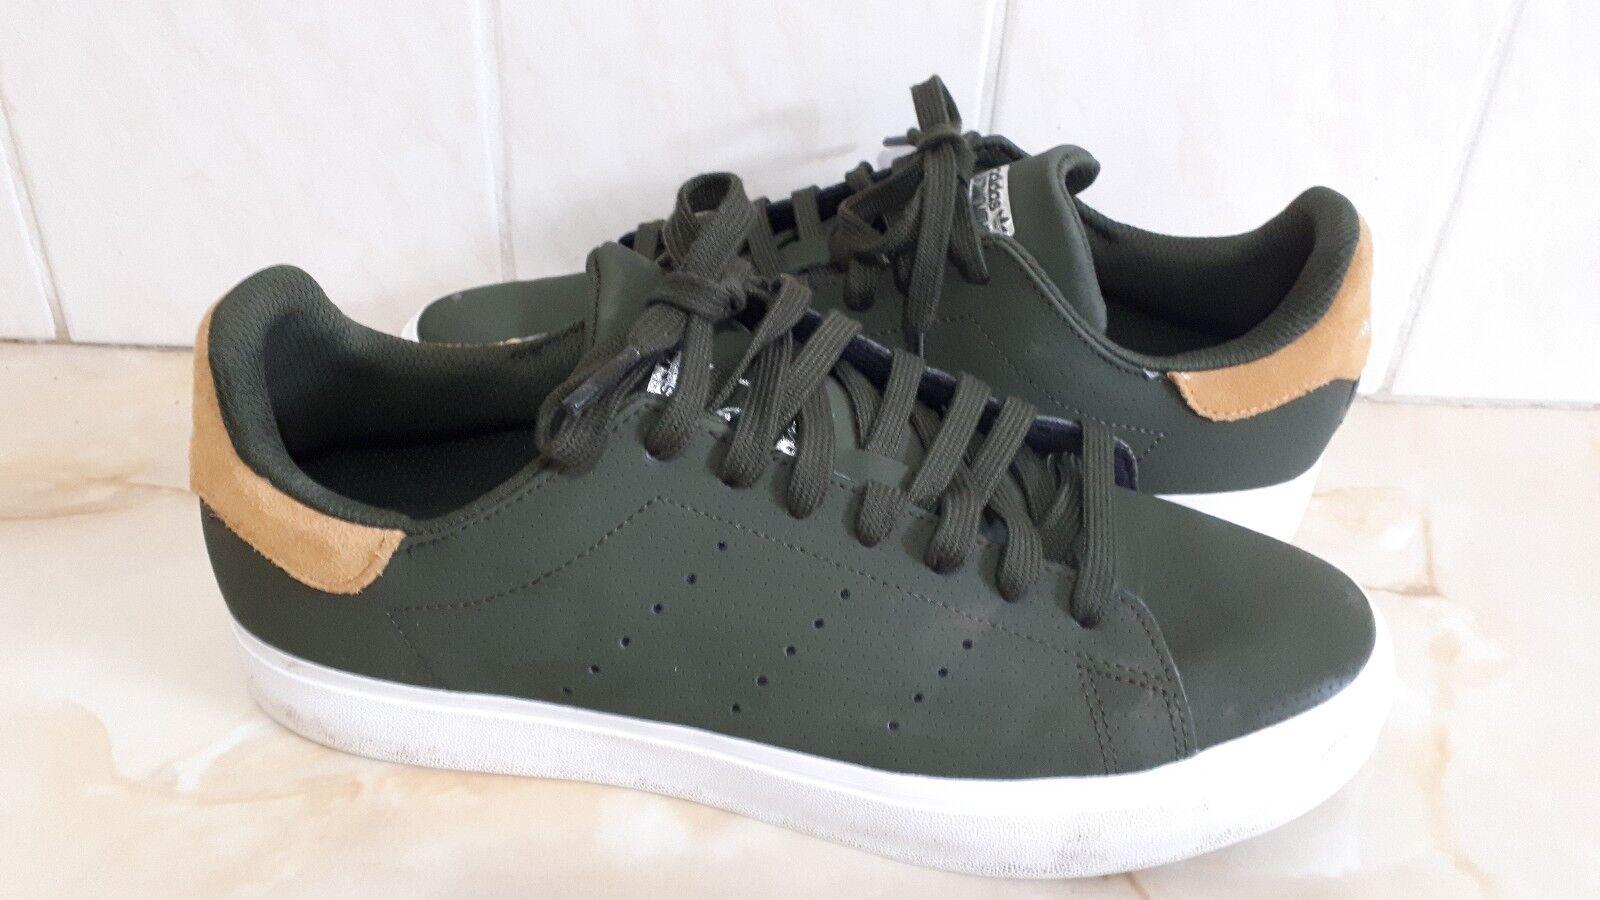 Rare Adidas Official Lifestyle Khaki Green Stan Smith Trainer Uk 7